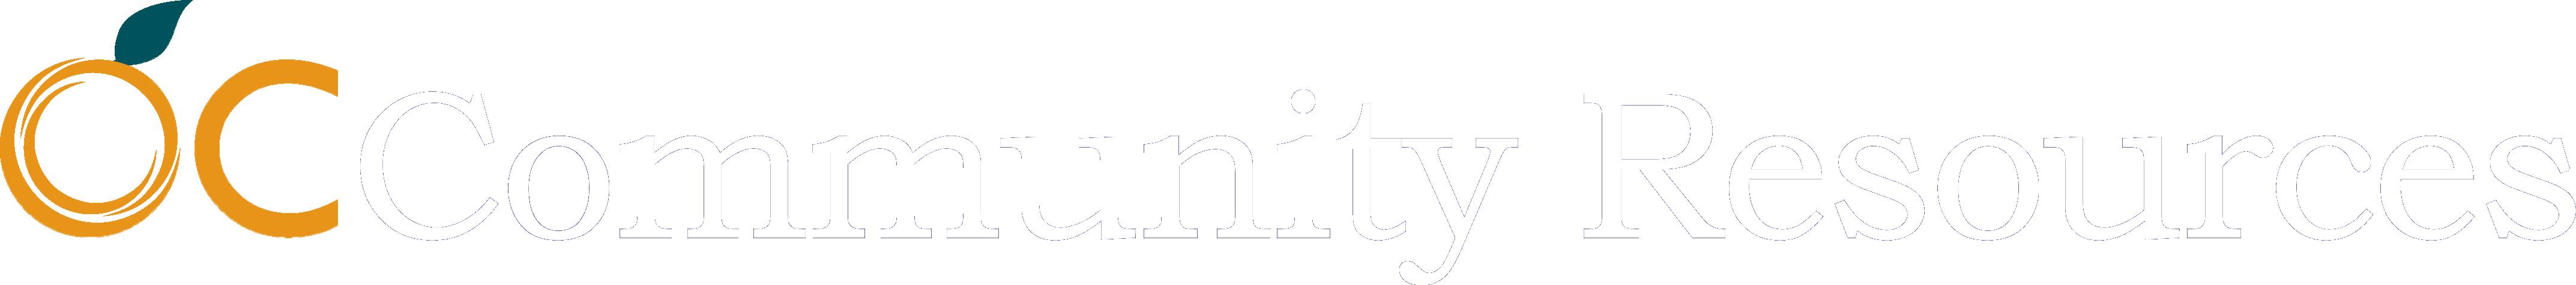 Orange County Community Resources logo